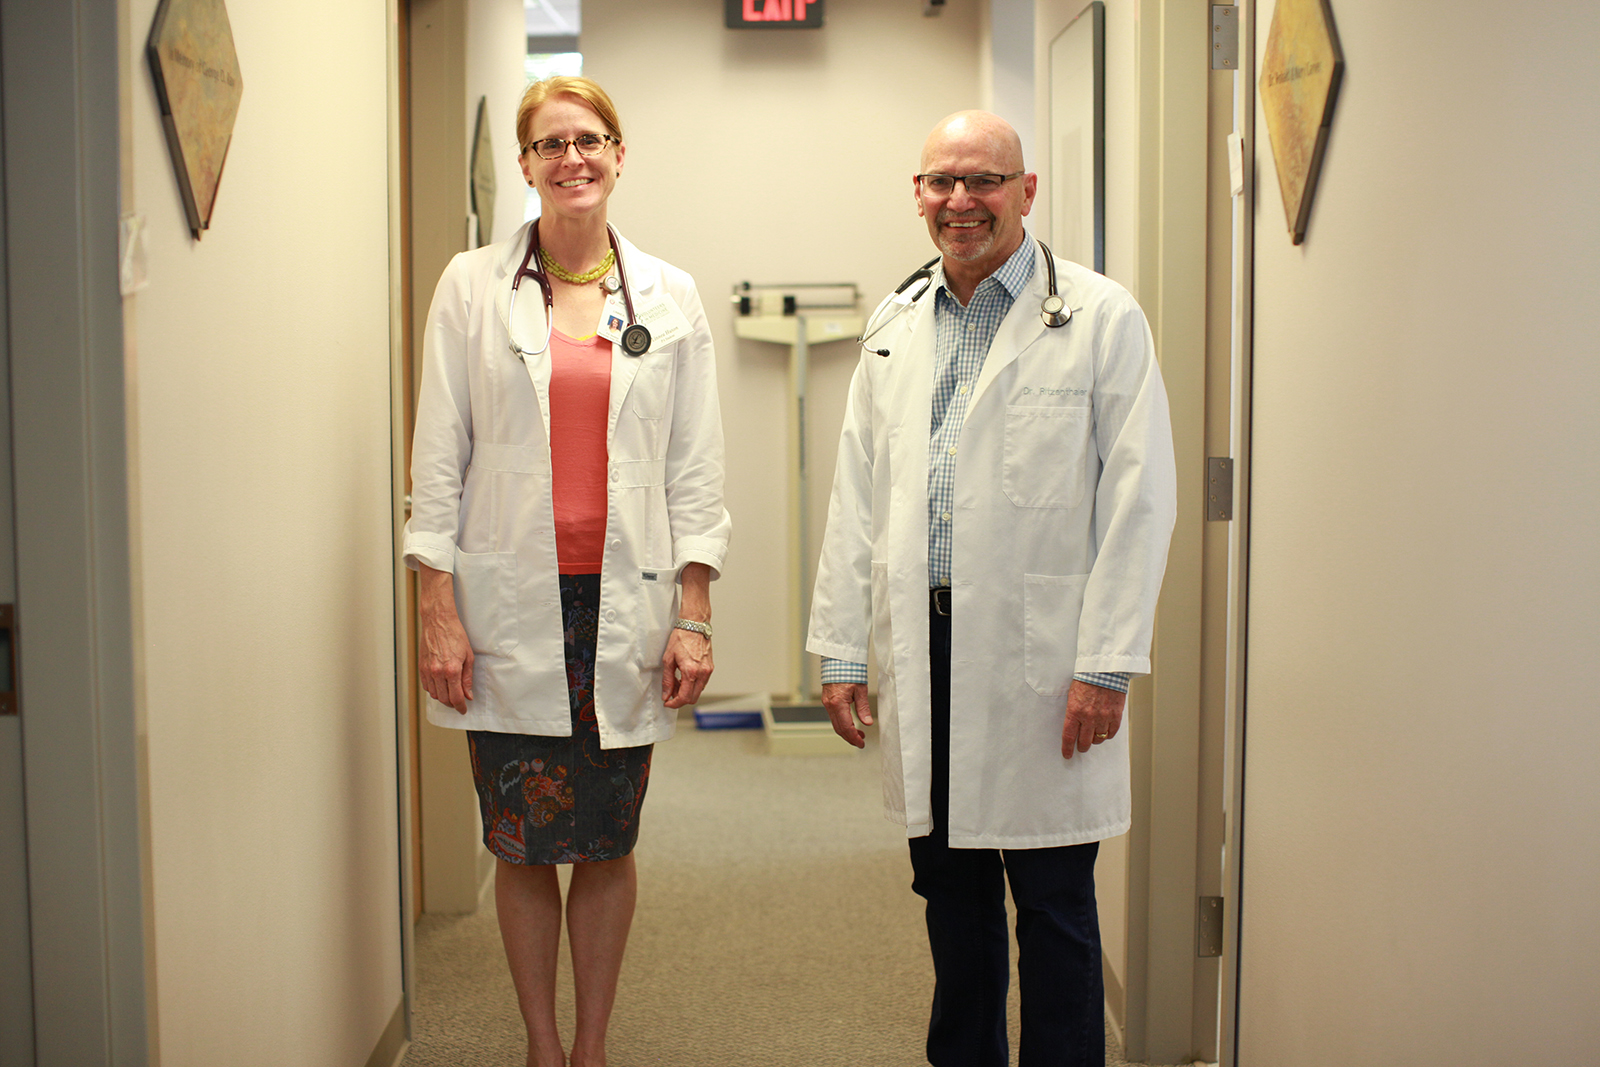 VIM is seeking a new Medical Director